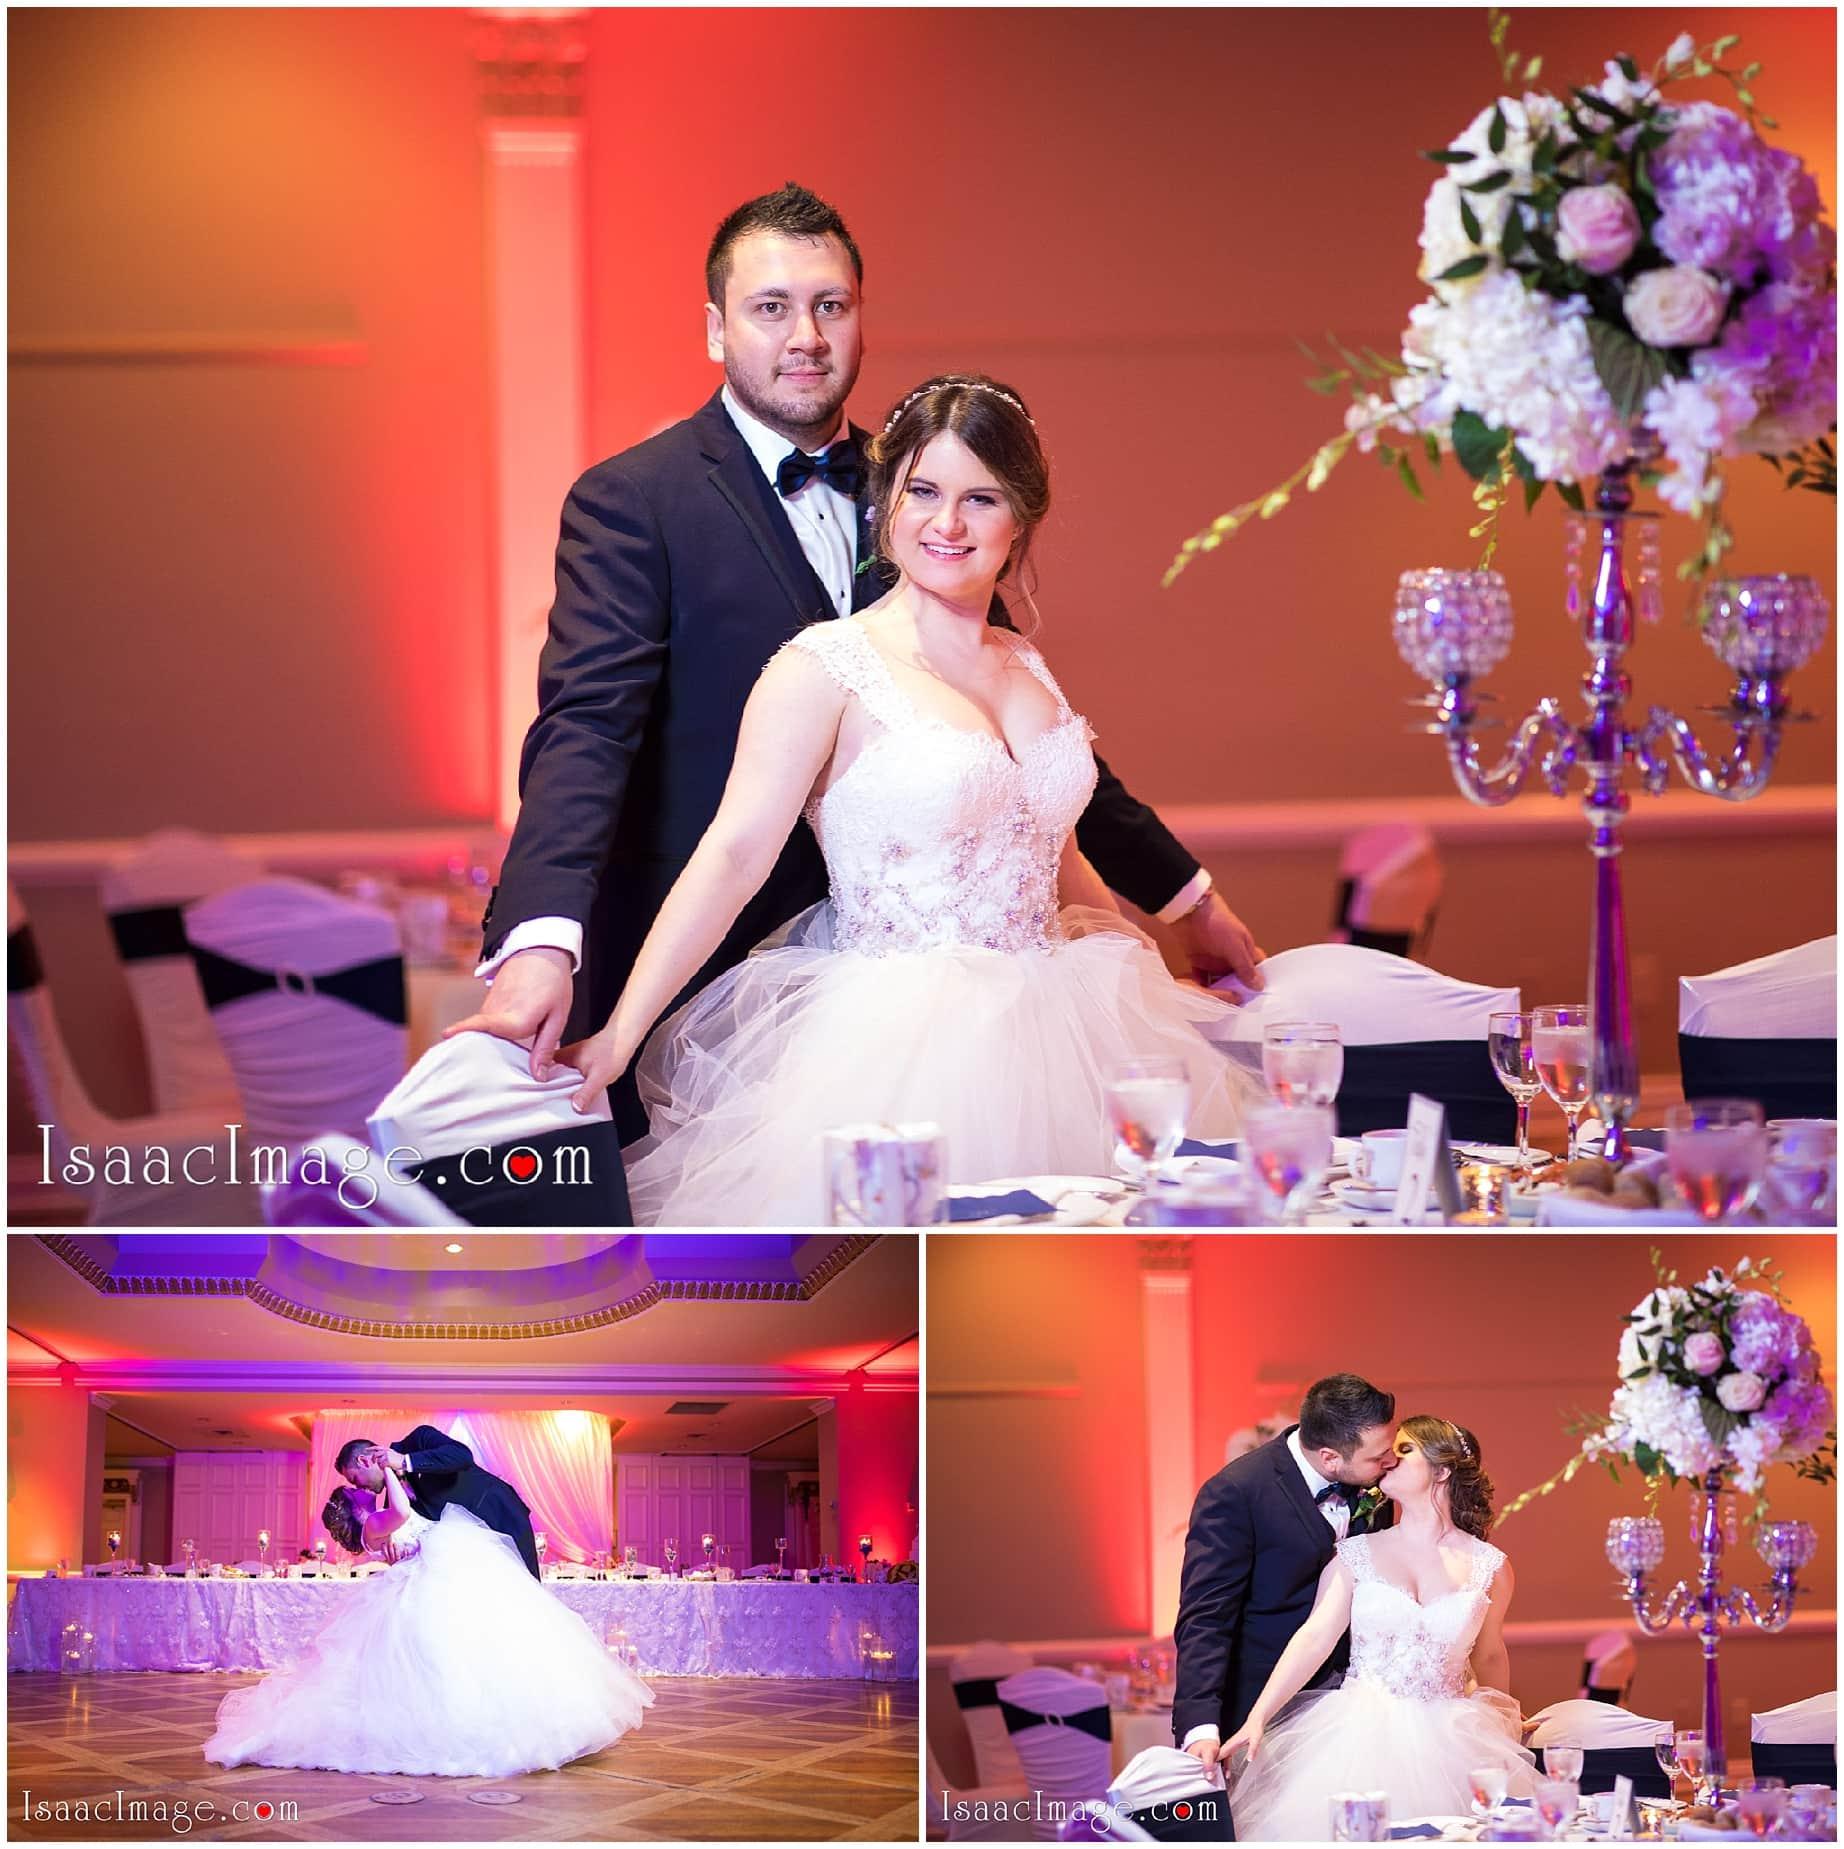 Queens Landing Hotel Wedding Niagara On The Lake Ian and Sasha_0815.jpg